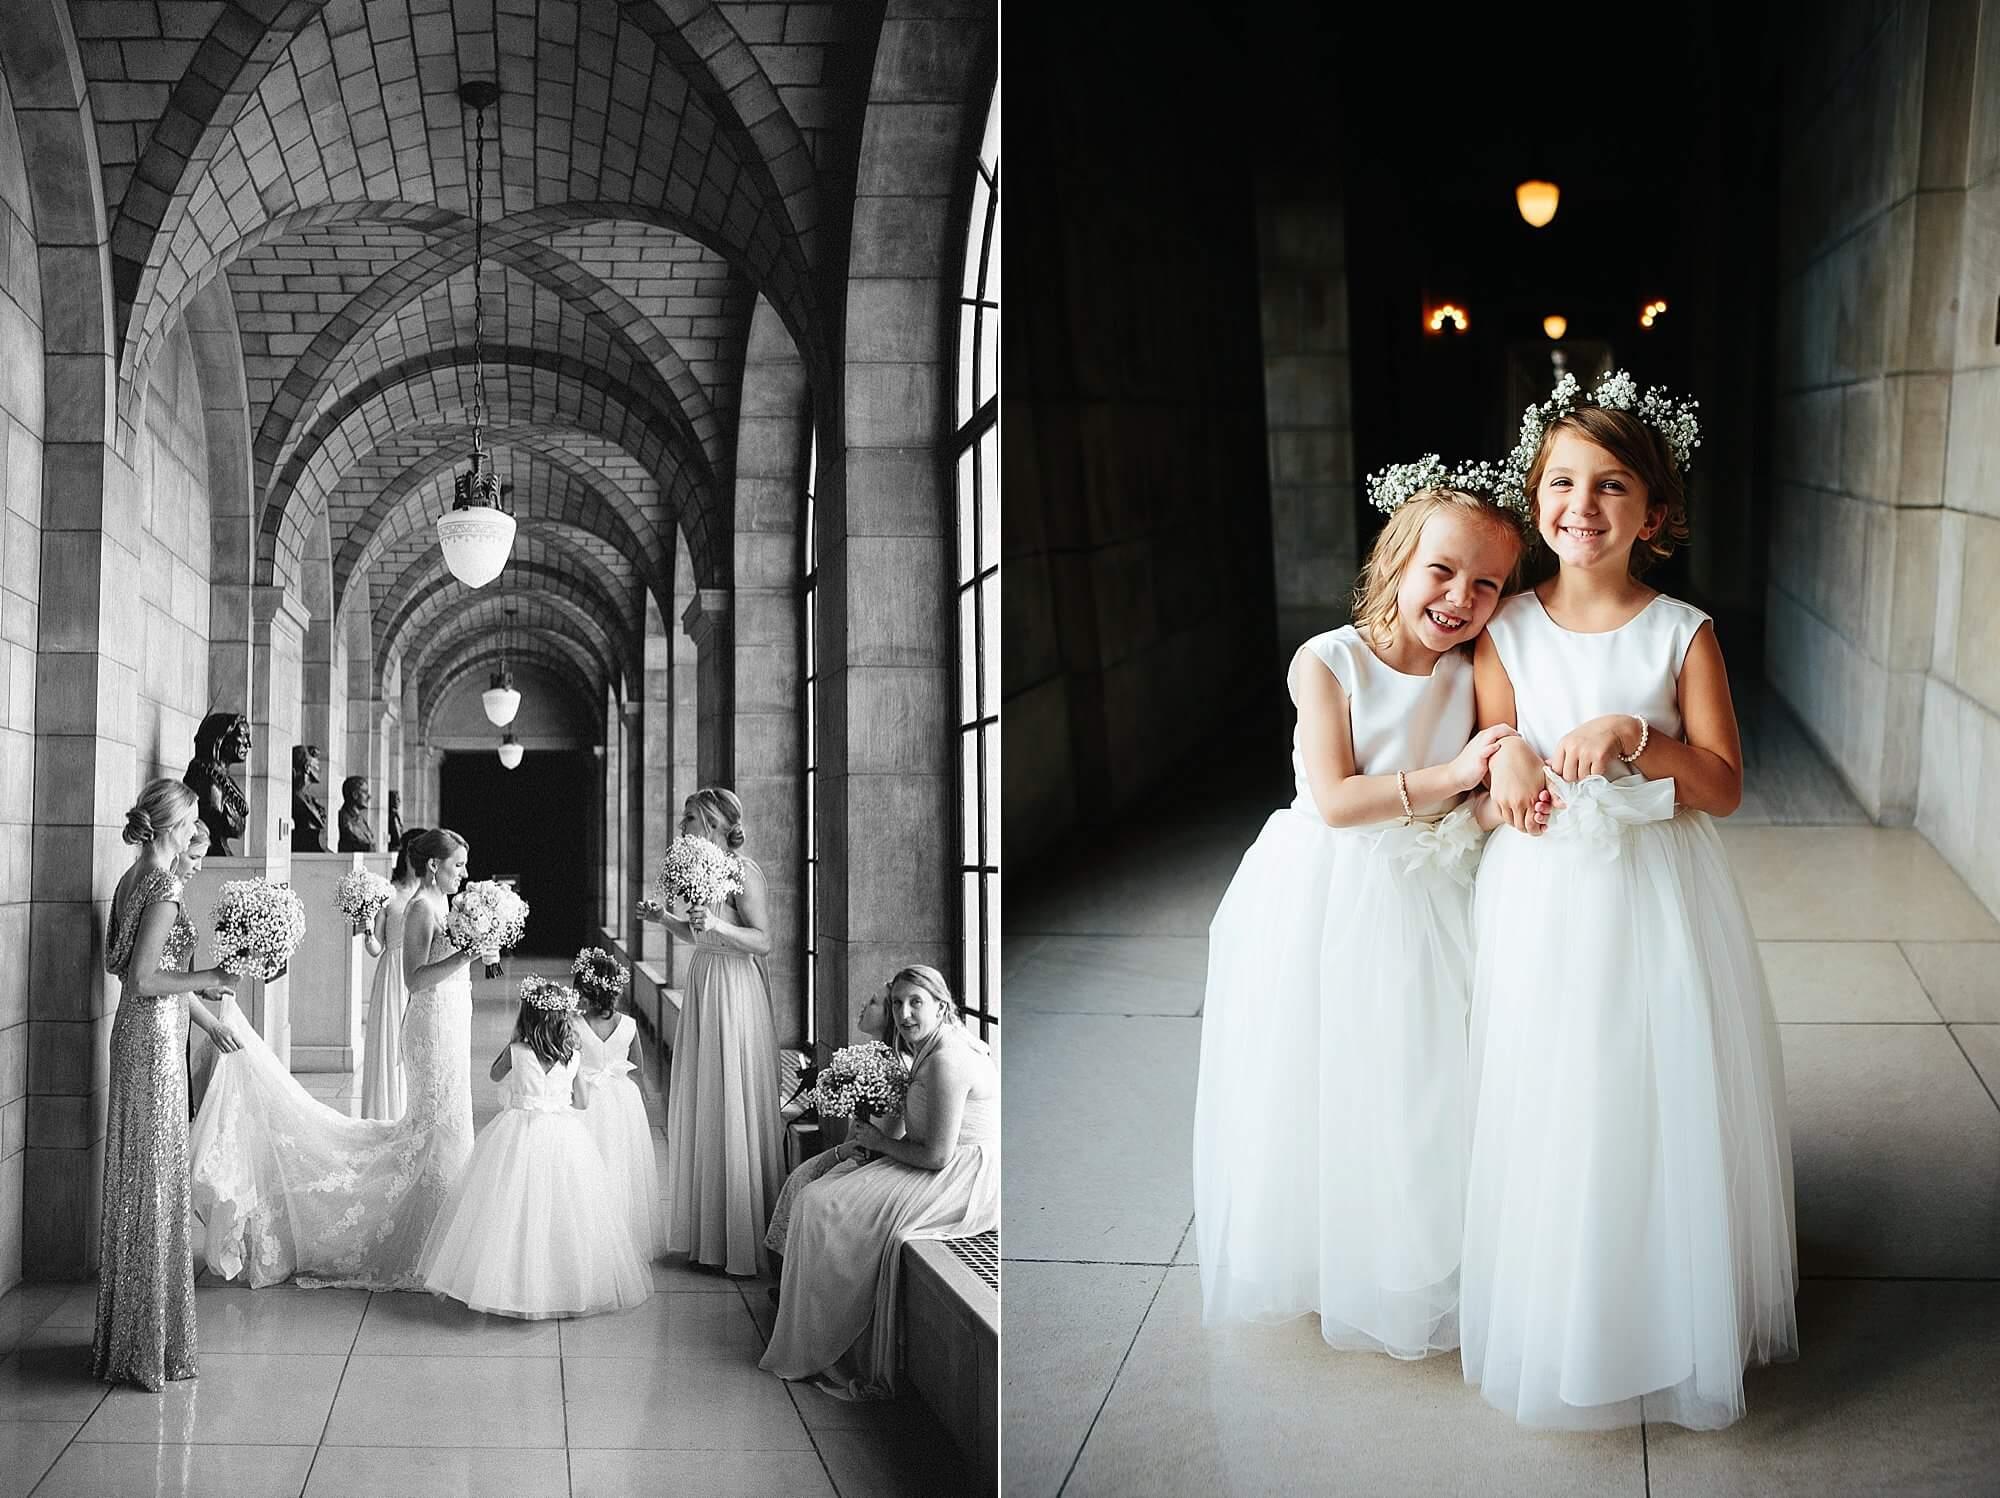 Lincoln, Nebraska  |  Blush, neutral wedding tones  |  Dana Osborne Design Wedding Invitations